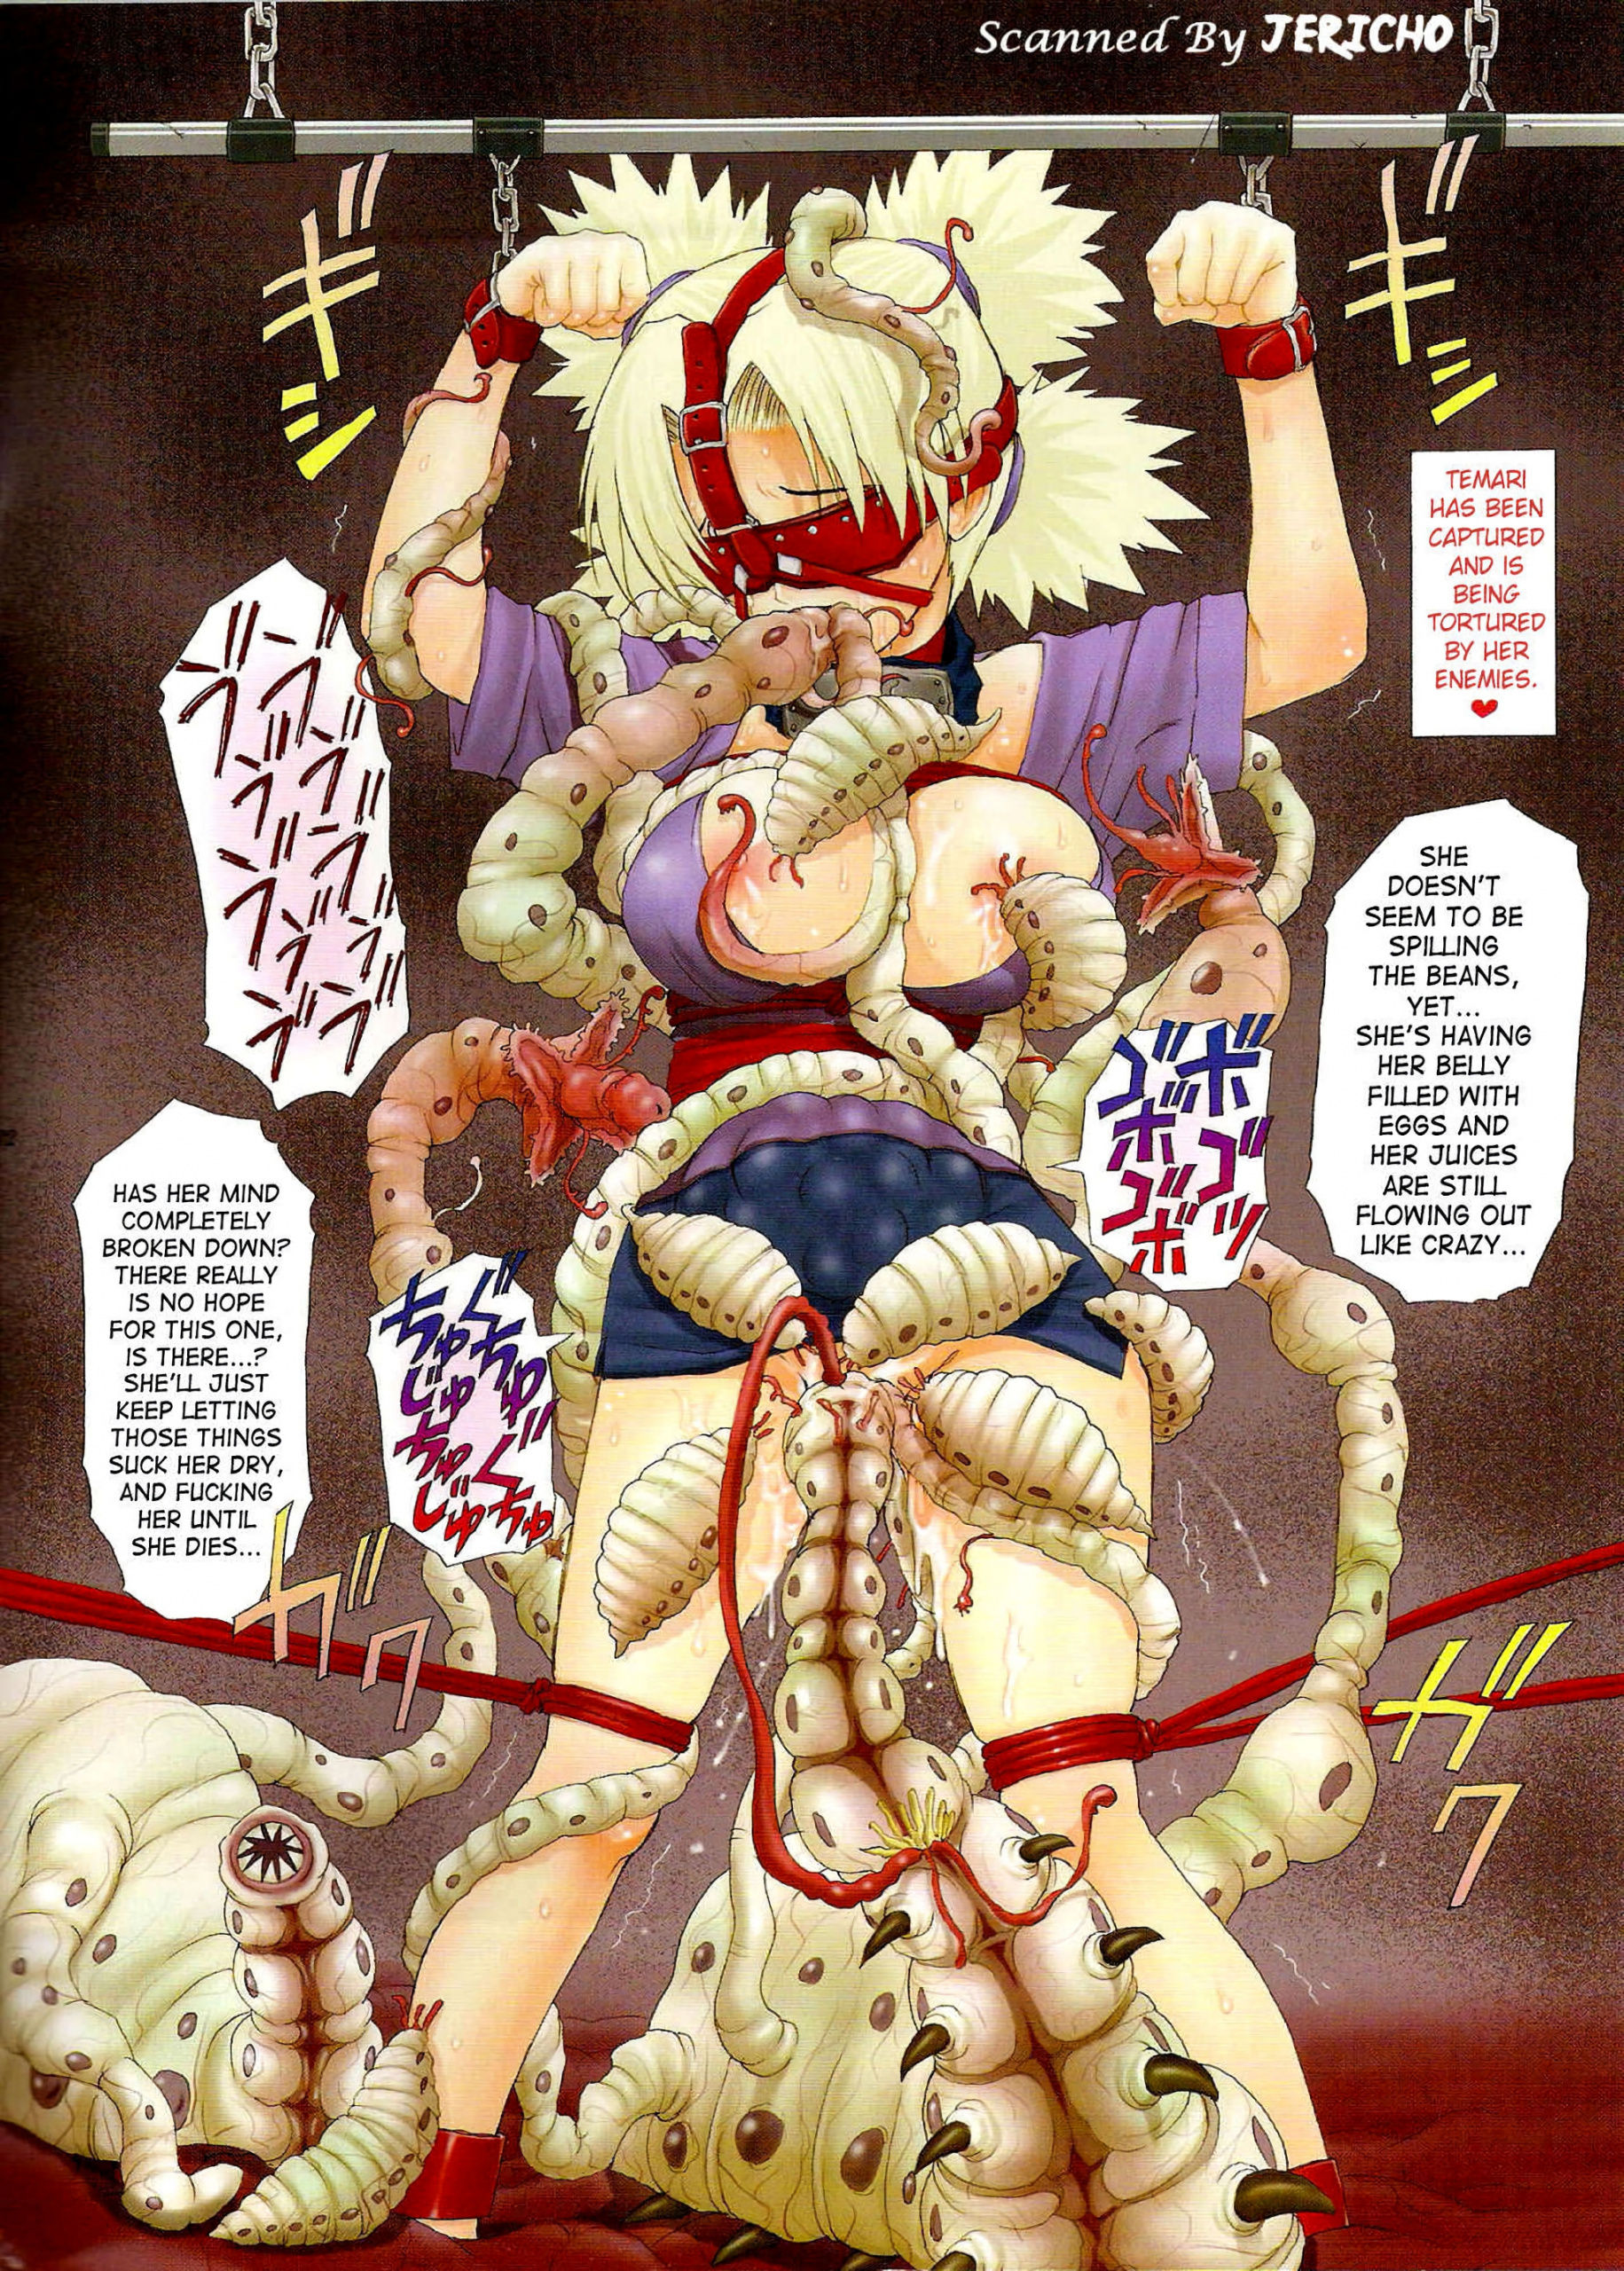 Pm 10 indecent ninja training hentai manga picture 2